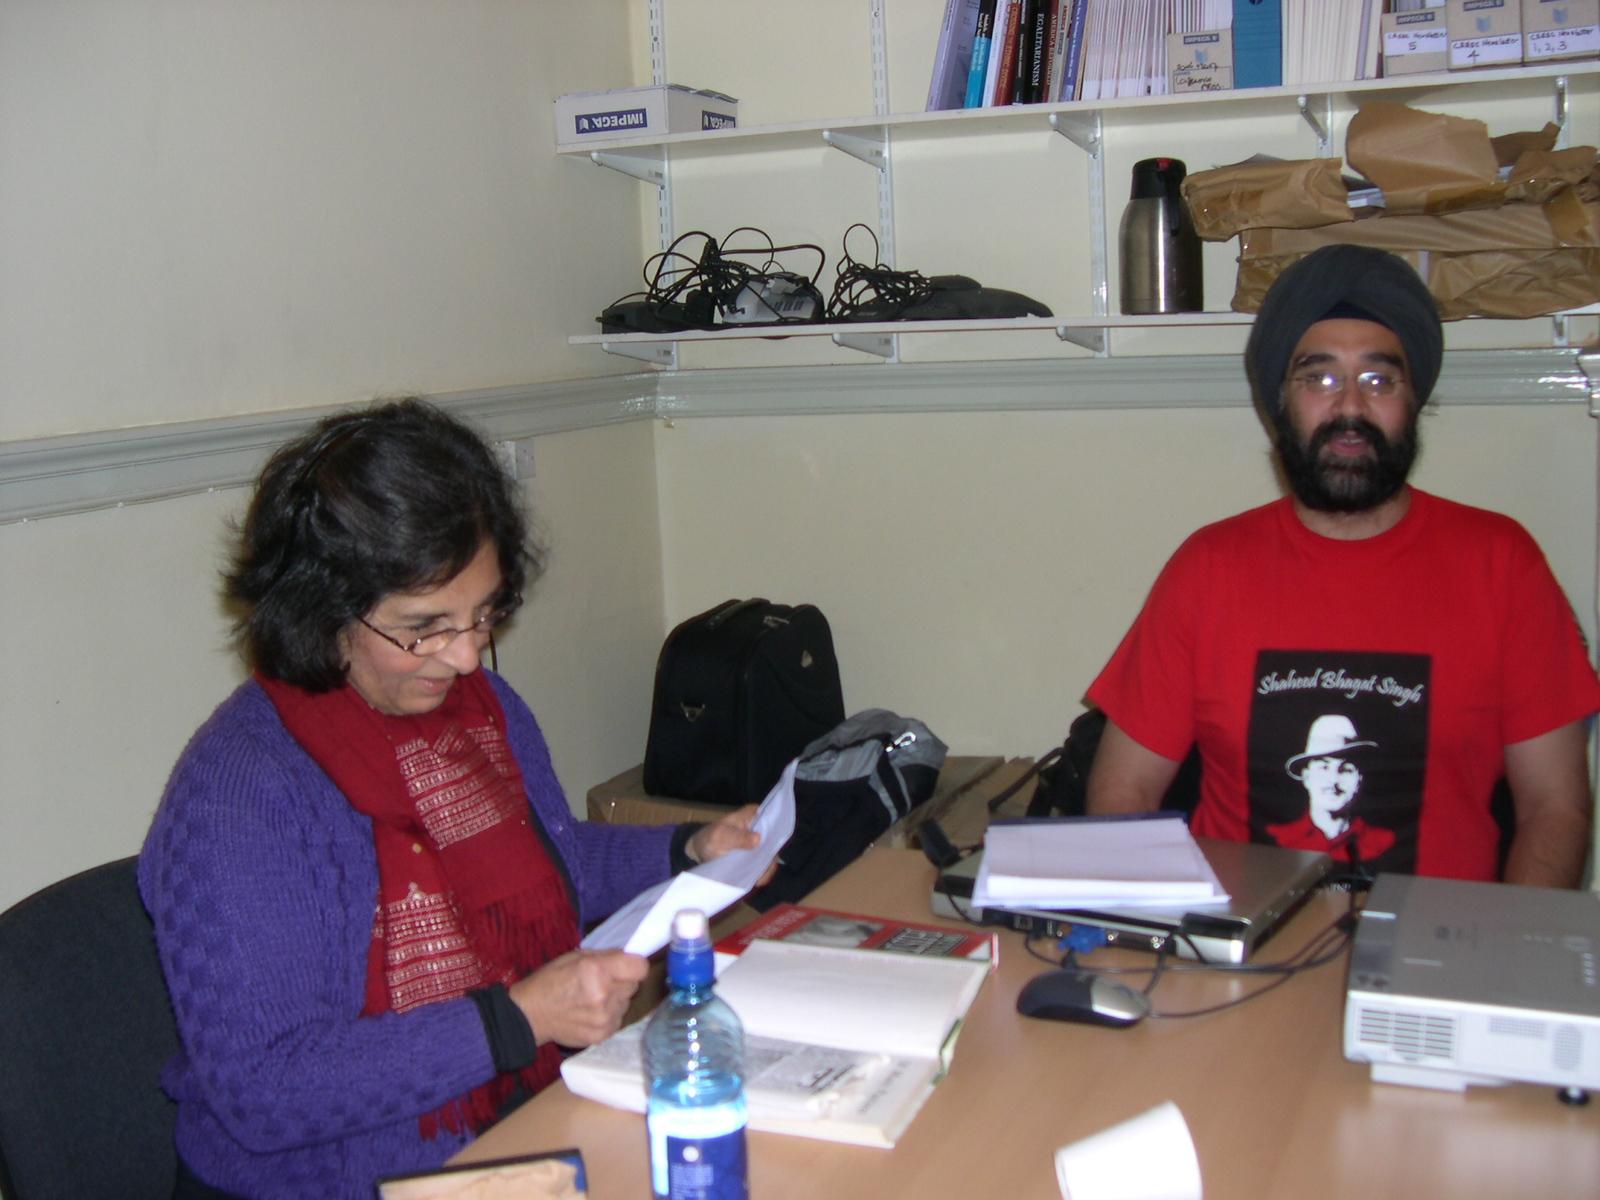 Pratima Mitchell and Virinder Kalra